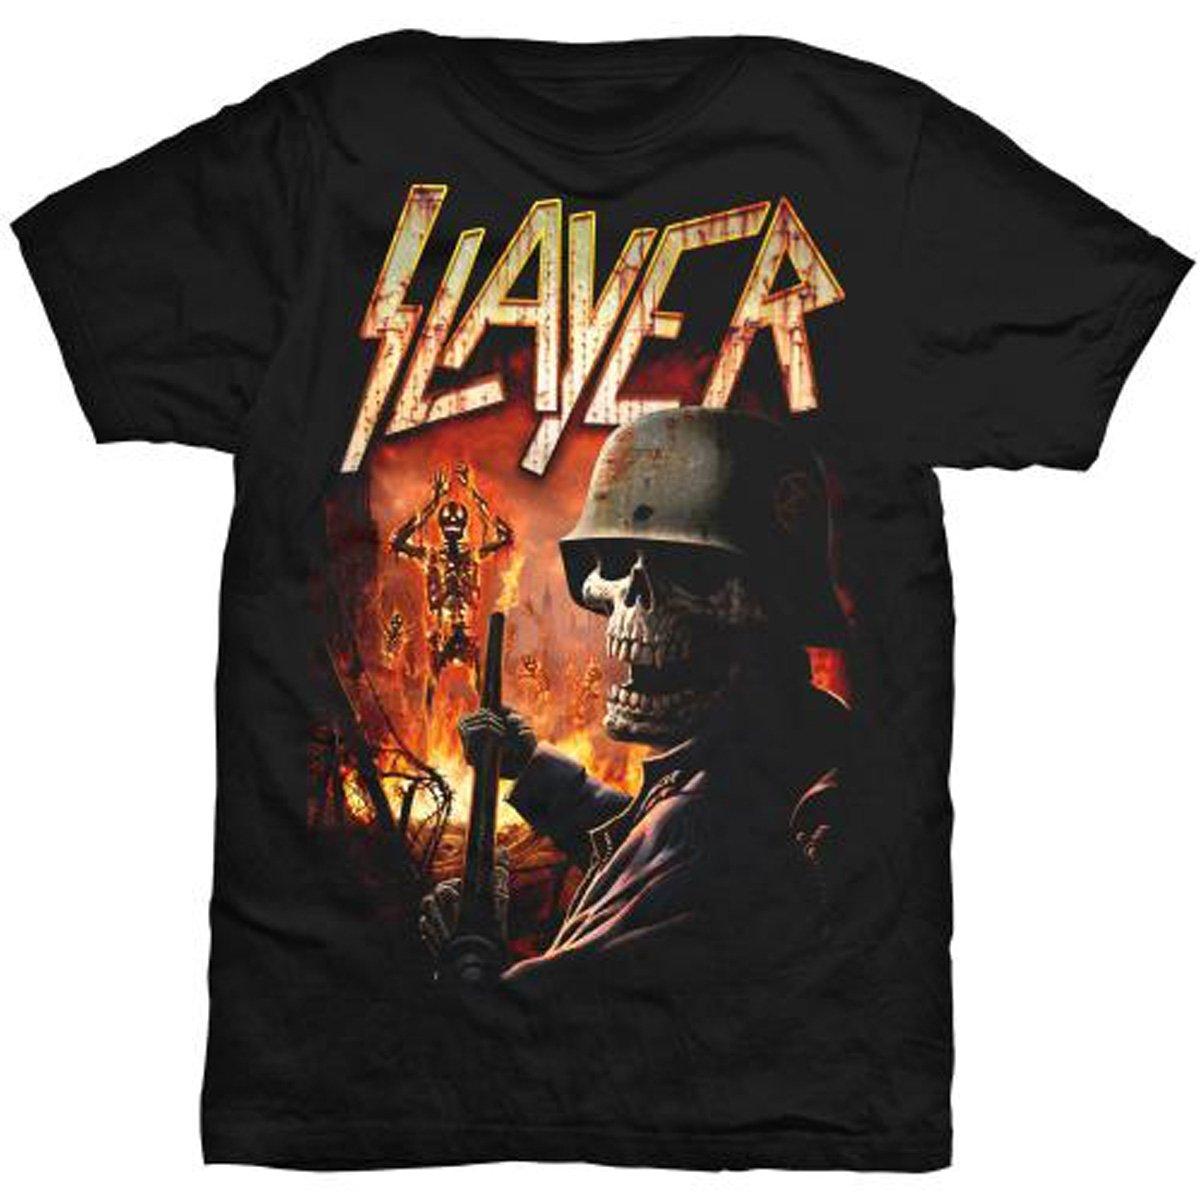 AWDIP Mens Official Slayer Zombie Torch T-Shirt Band Metallica USA Black